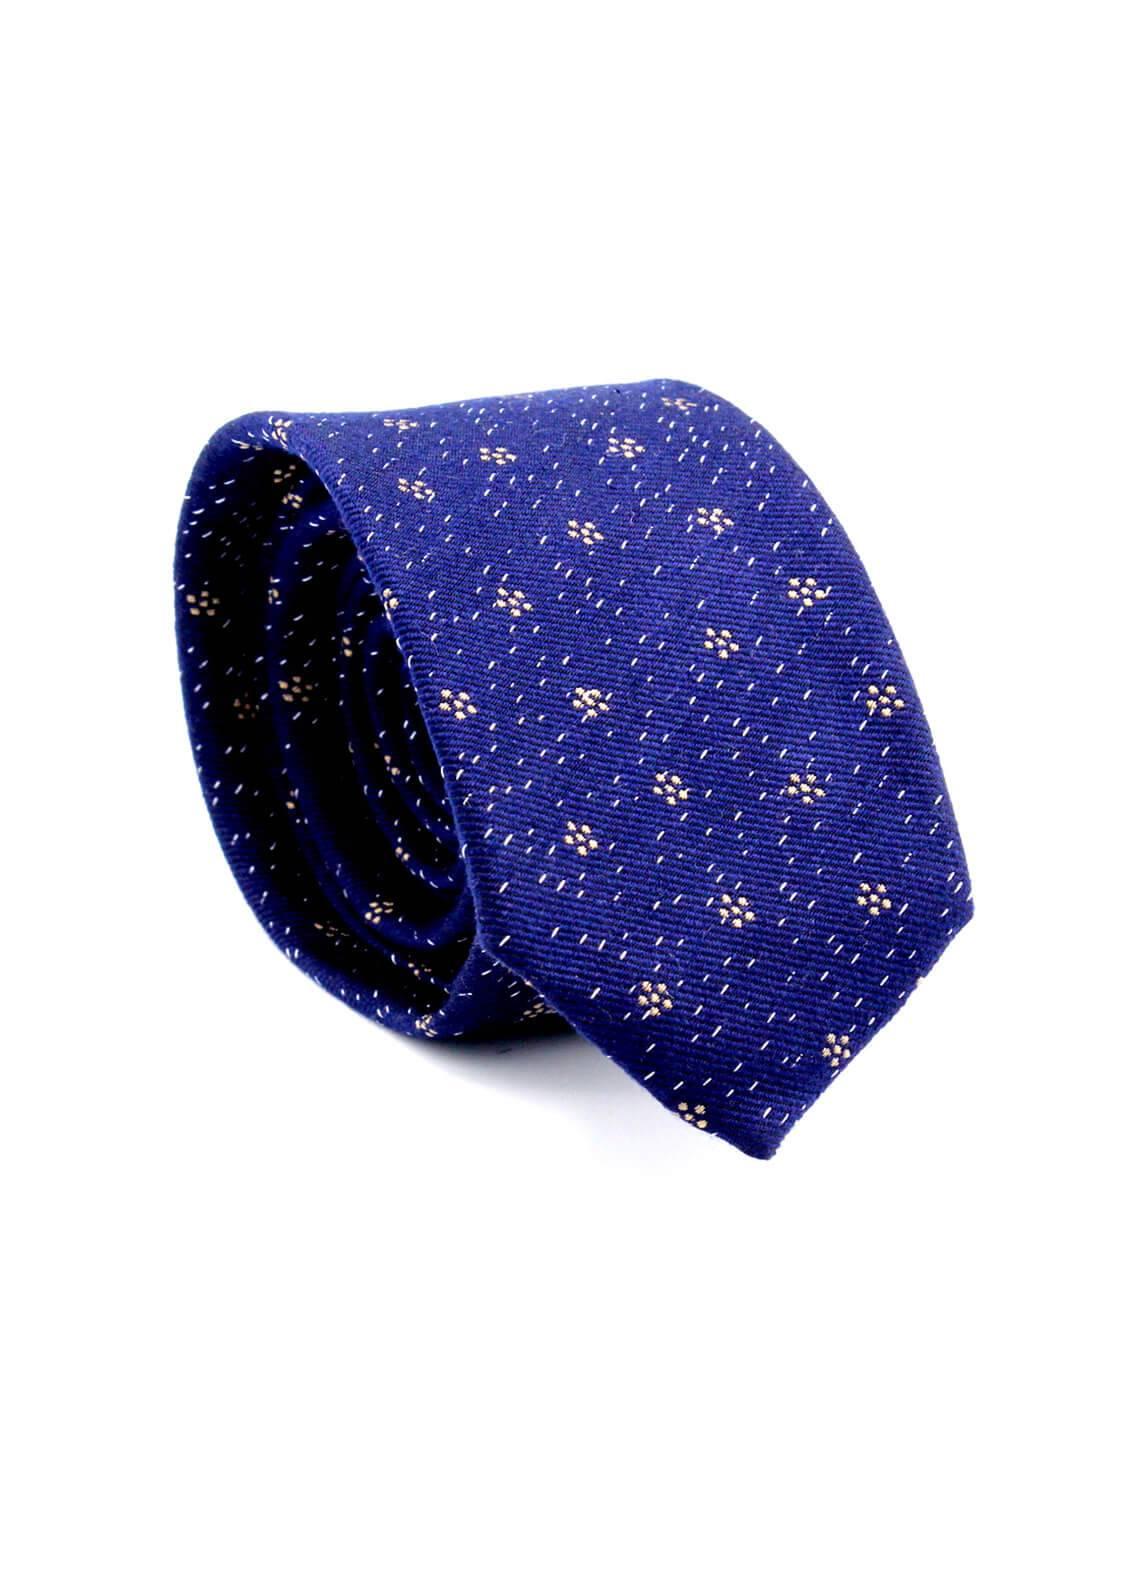 Skangen Narrow Wool Neck Tie Neck Tie SKTI-W-011 -